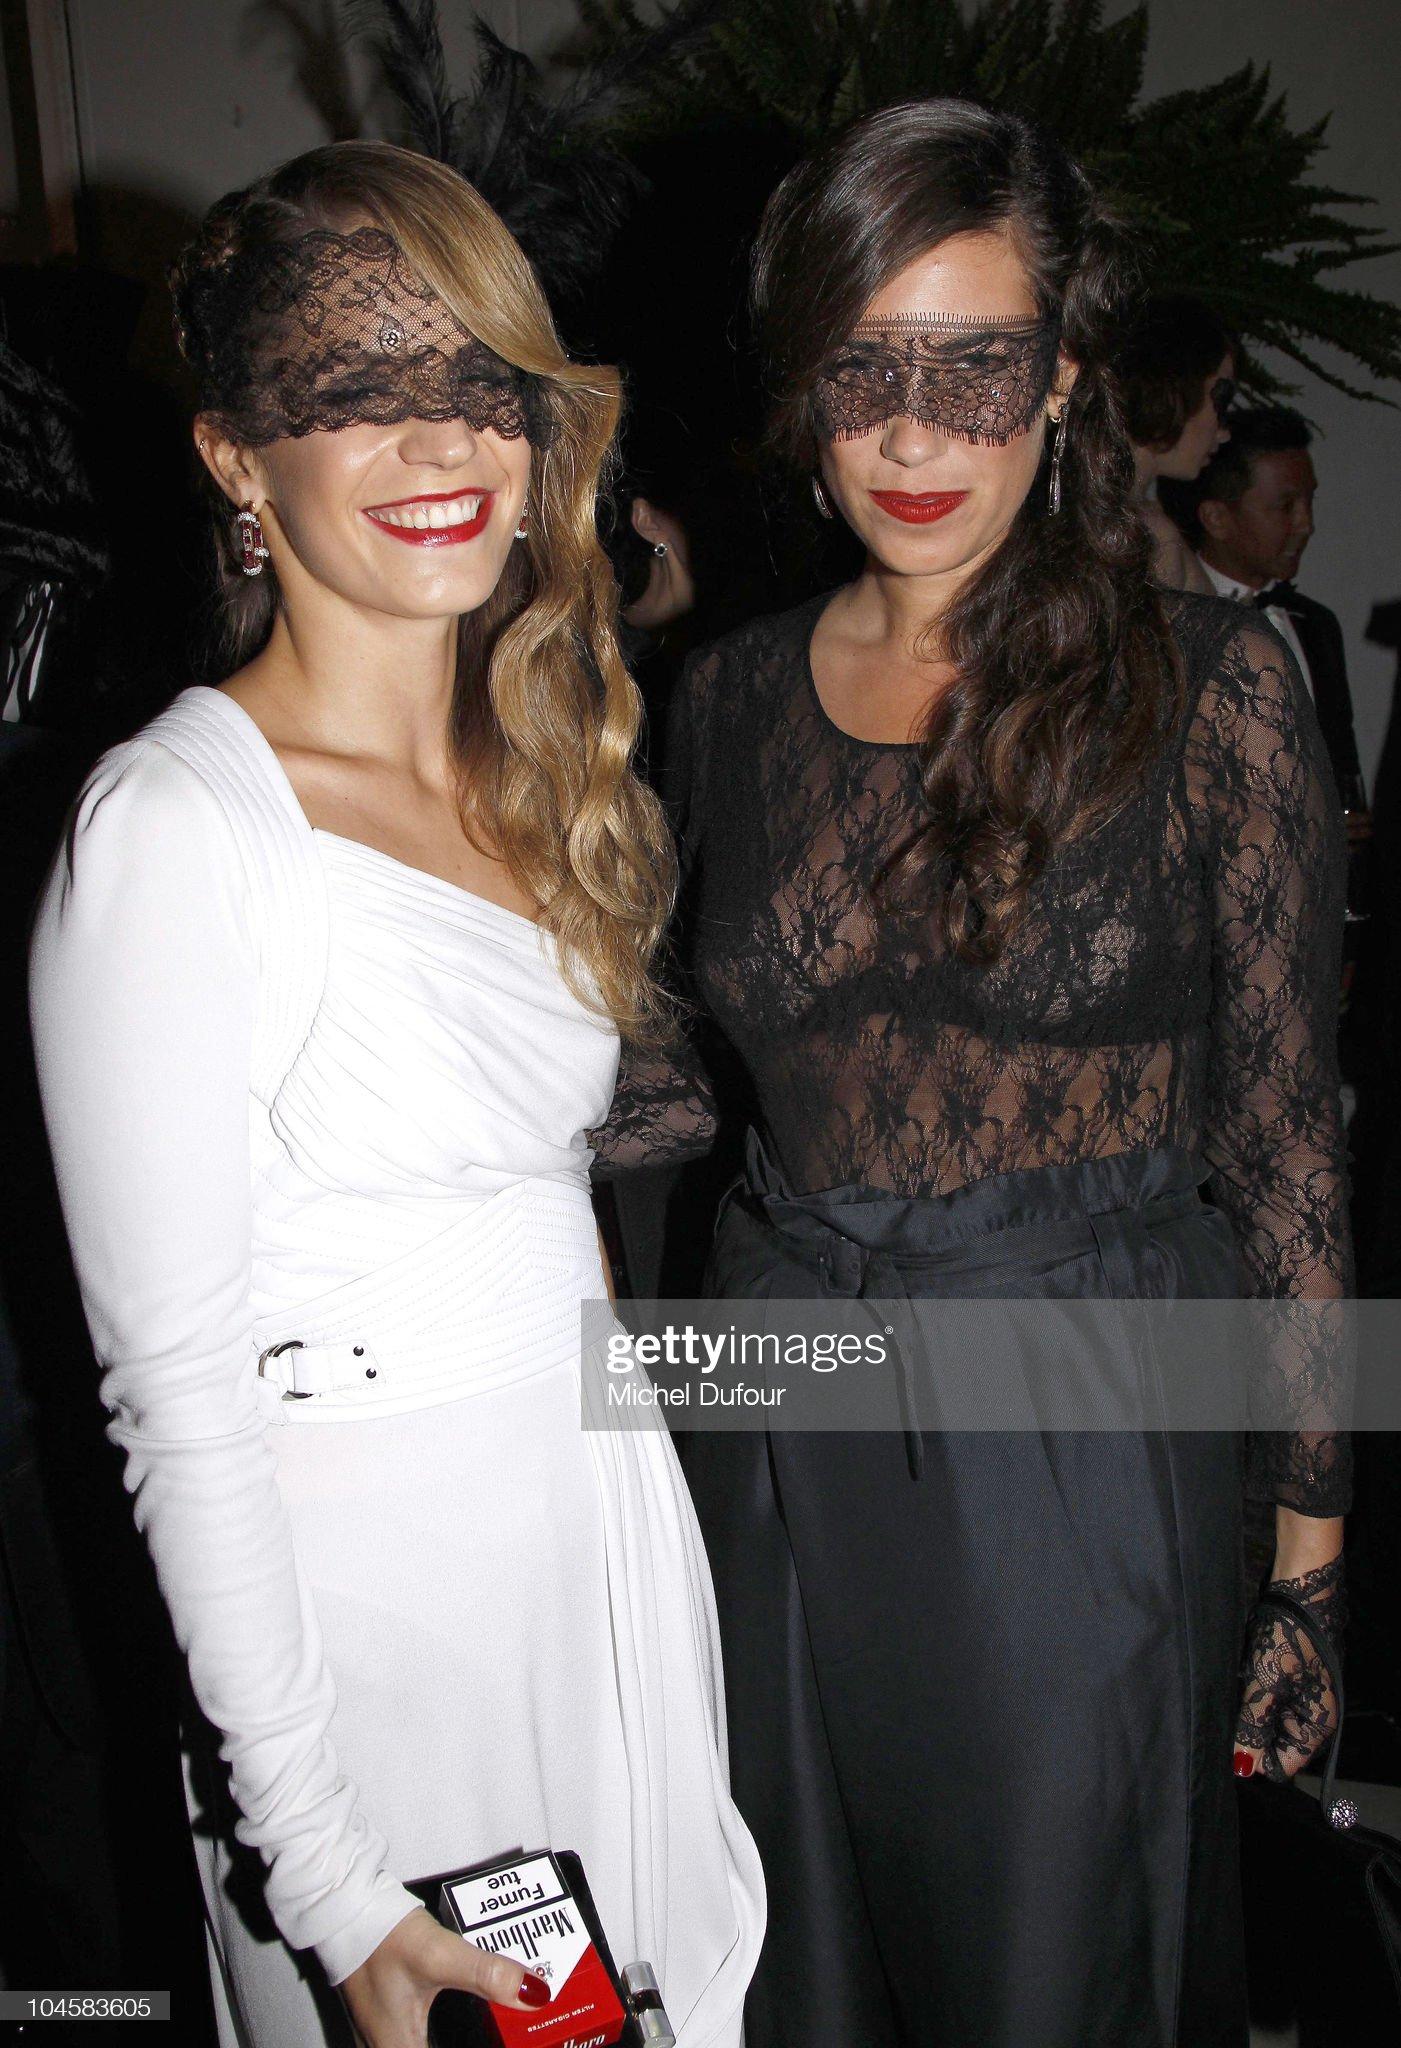 Vogue 90th Anniversary Party - Paris Fashion Week S/S 2011 - Photocall : News Photo